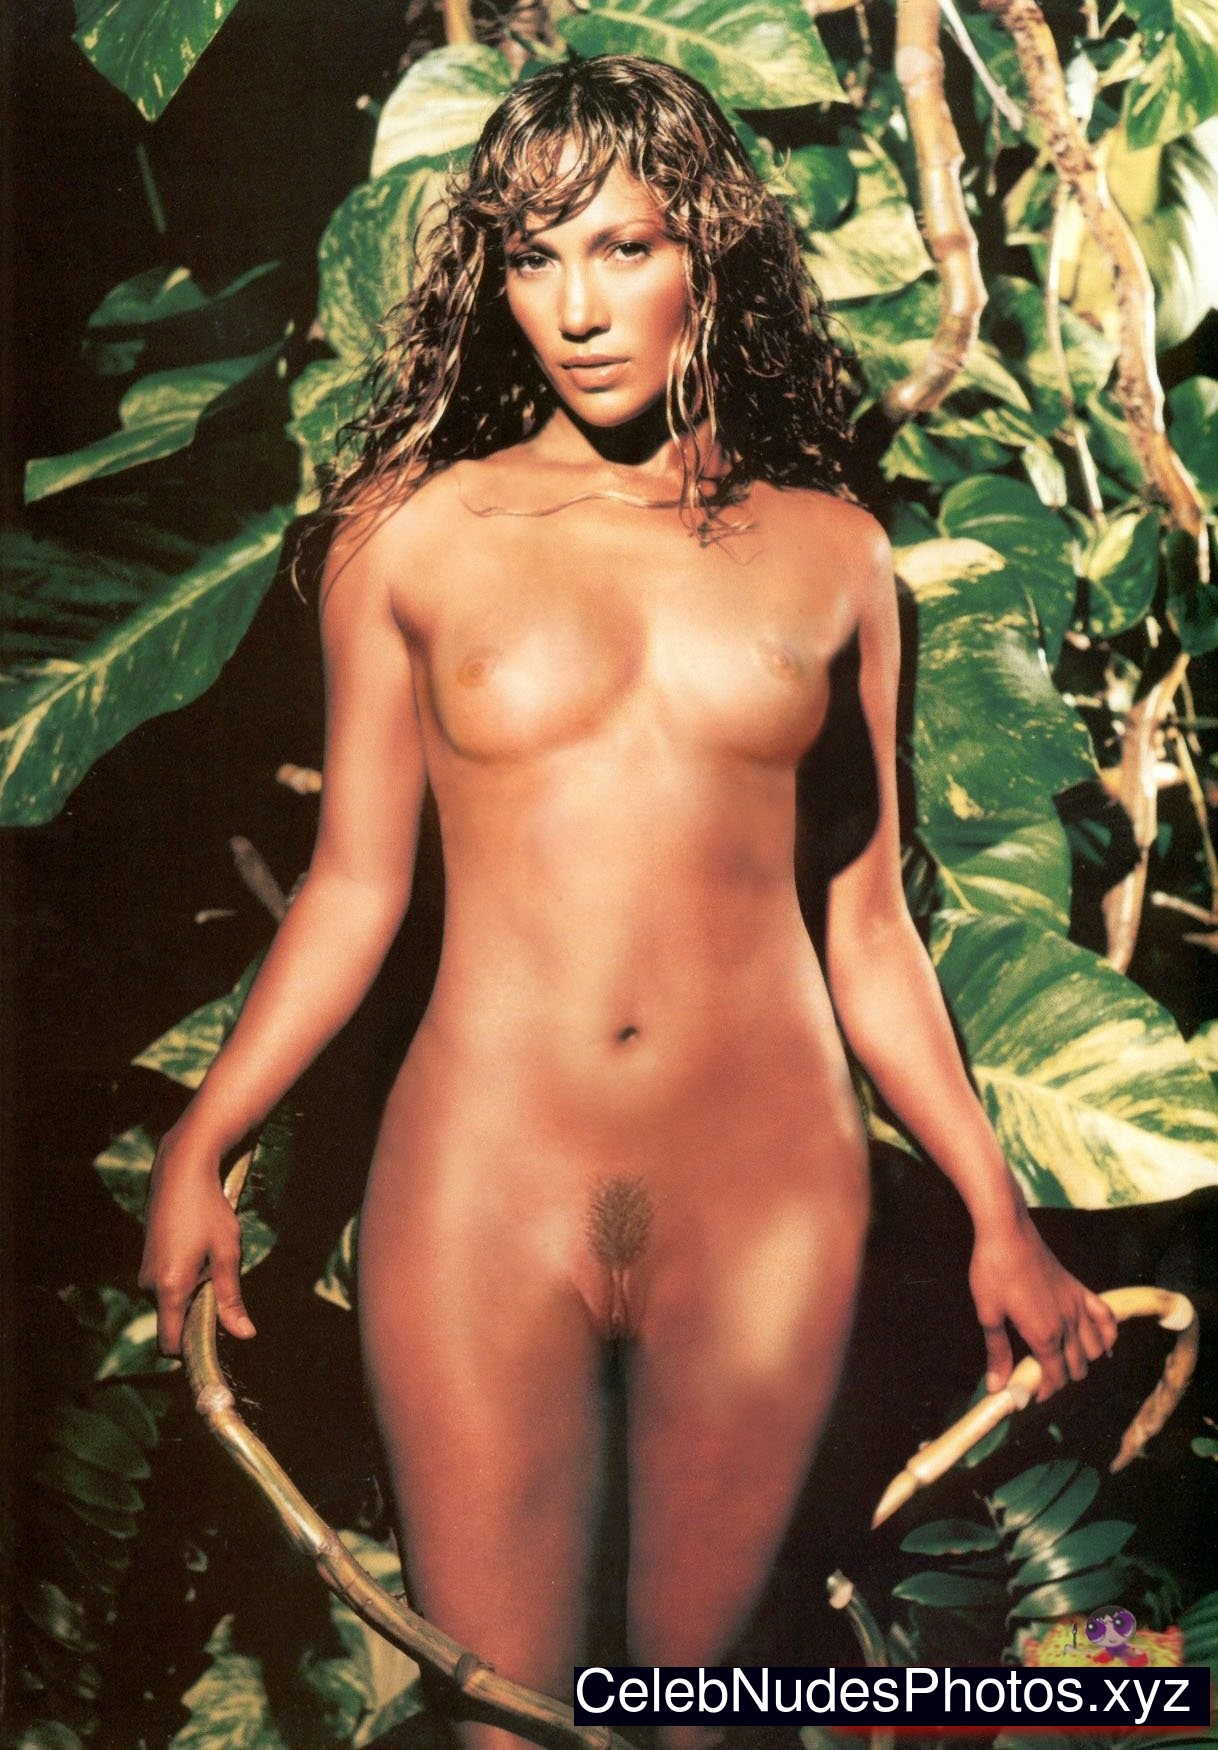 Nude girl in money